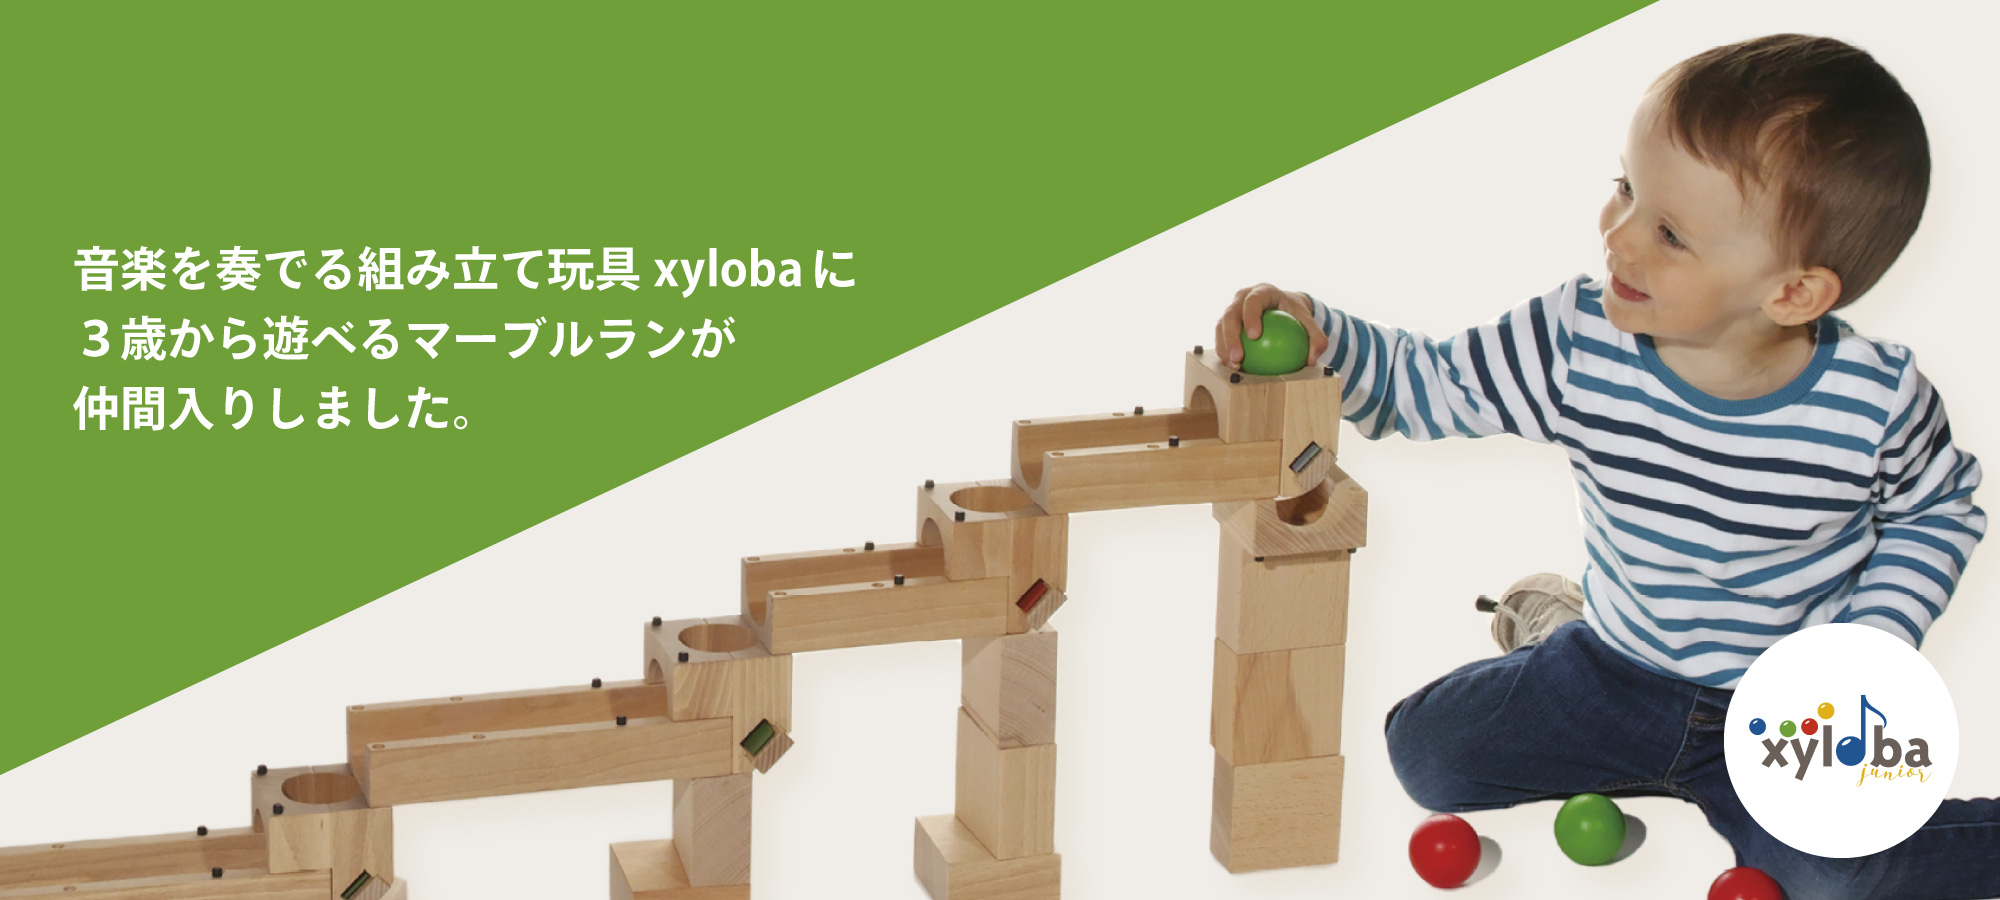 xyloba junior スイス生まれの木製マーブルランサイロバジュニア新発売